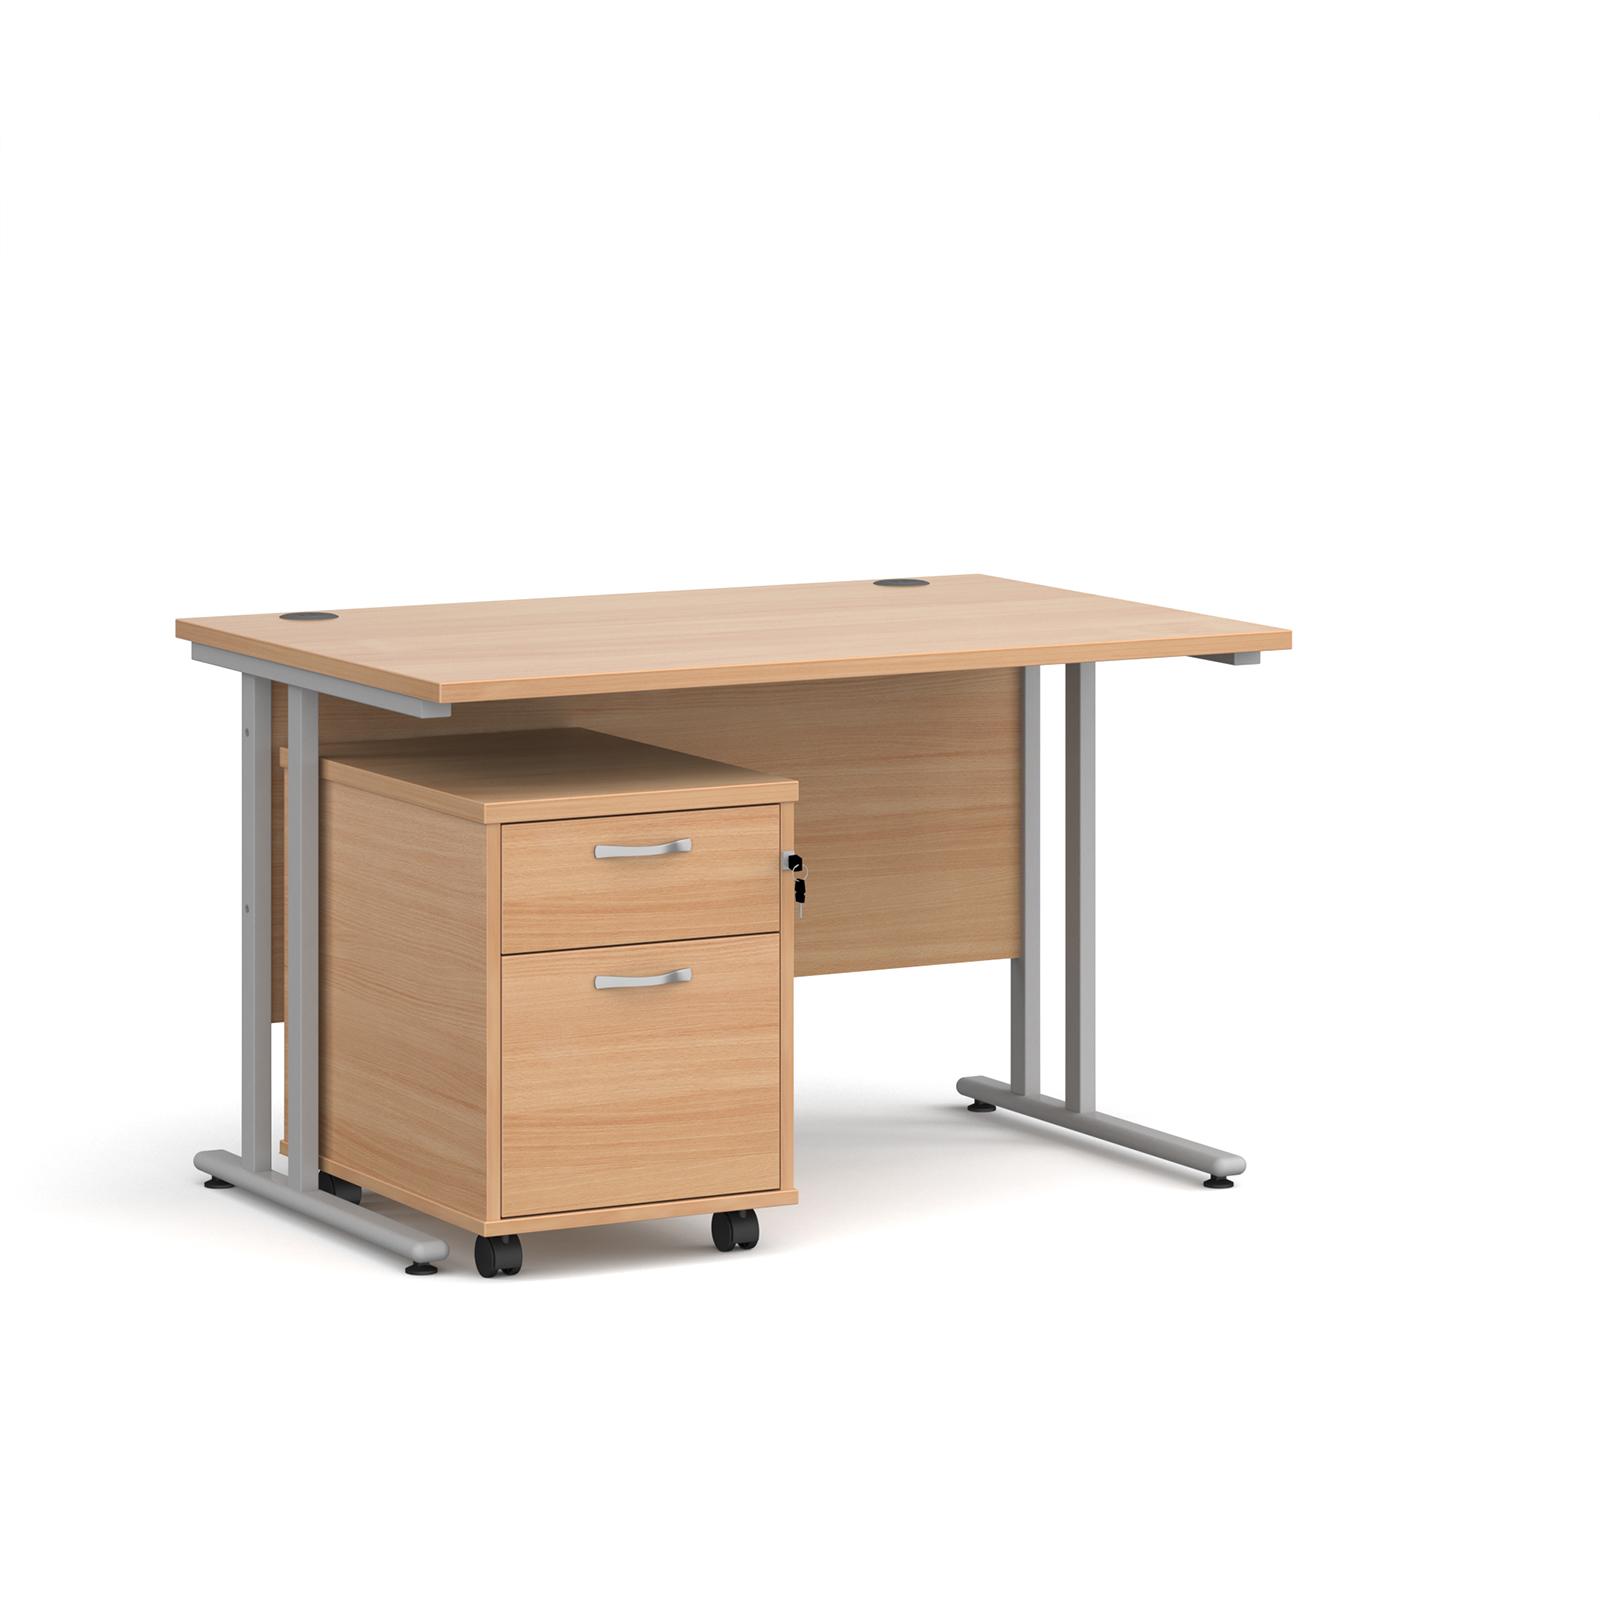 Desks Maestro 25 desk 800mm with 2 drawer pedestal